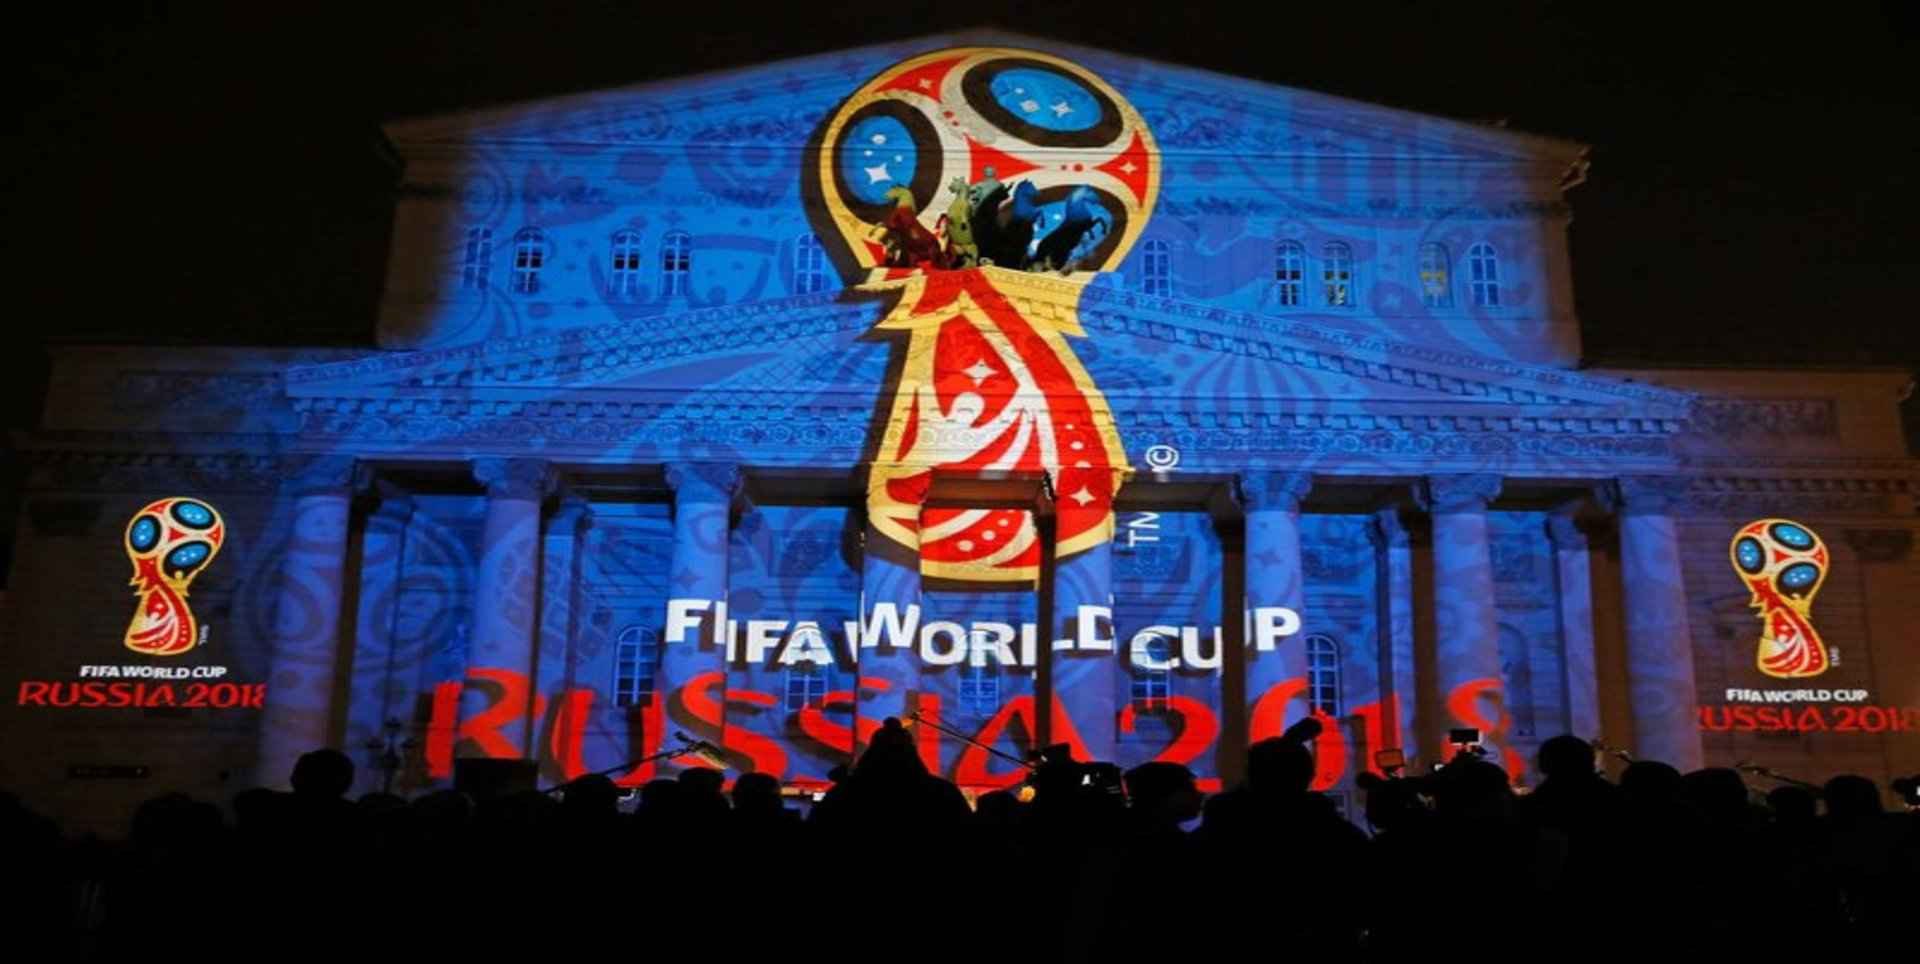 CONMEBOL Matchday 13 Uruguay VS Brazil Live